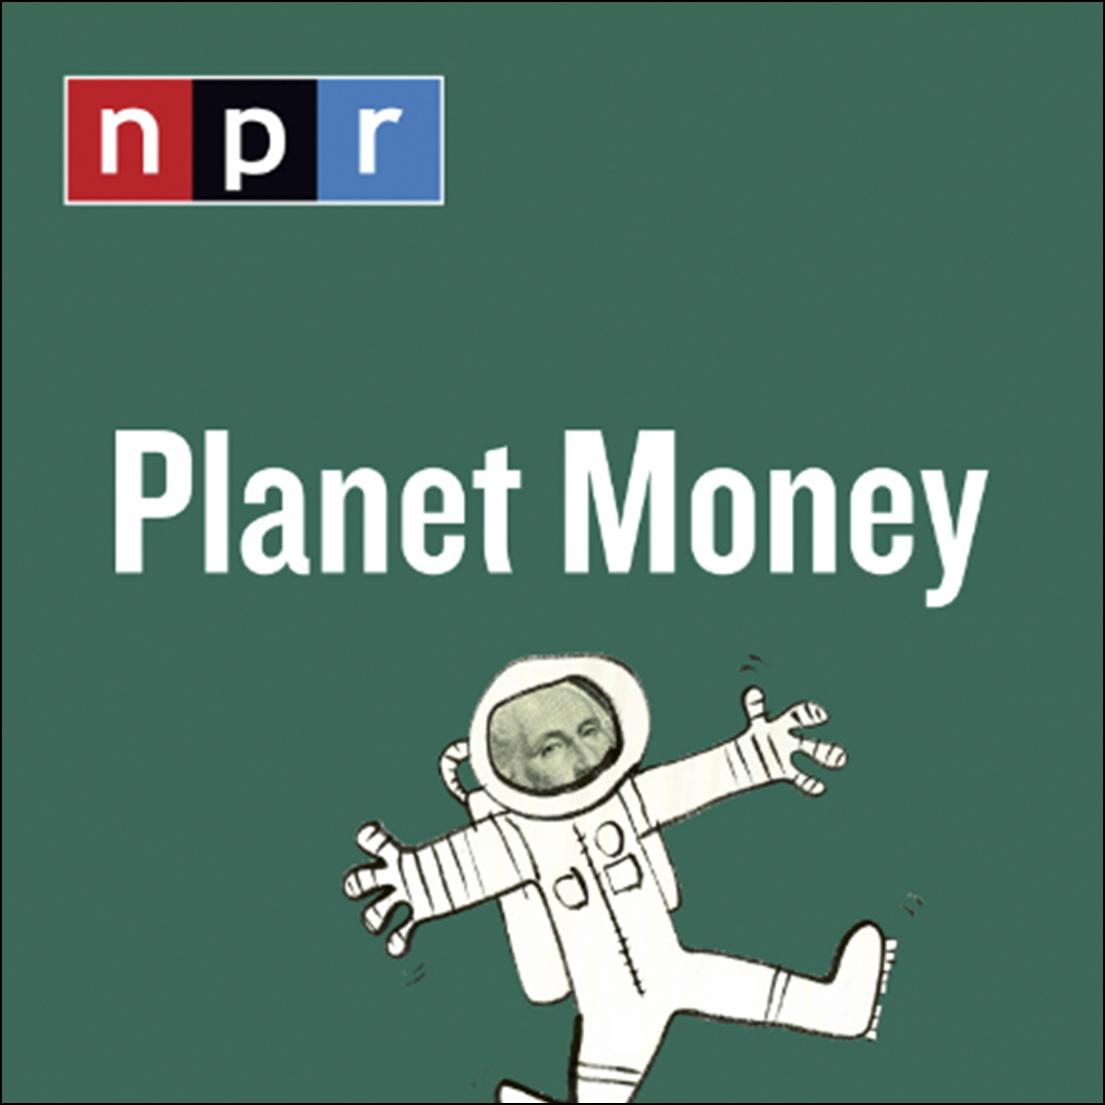 PlanetMoneyLogo_Square.jpg